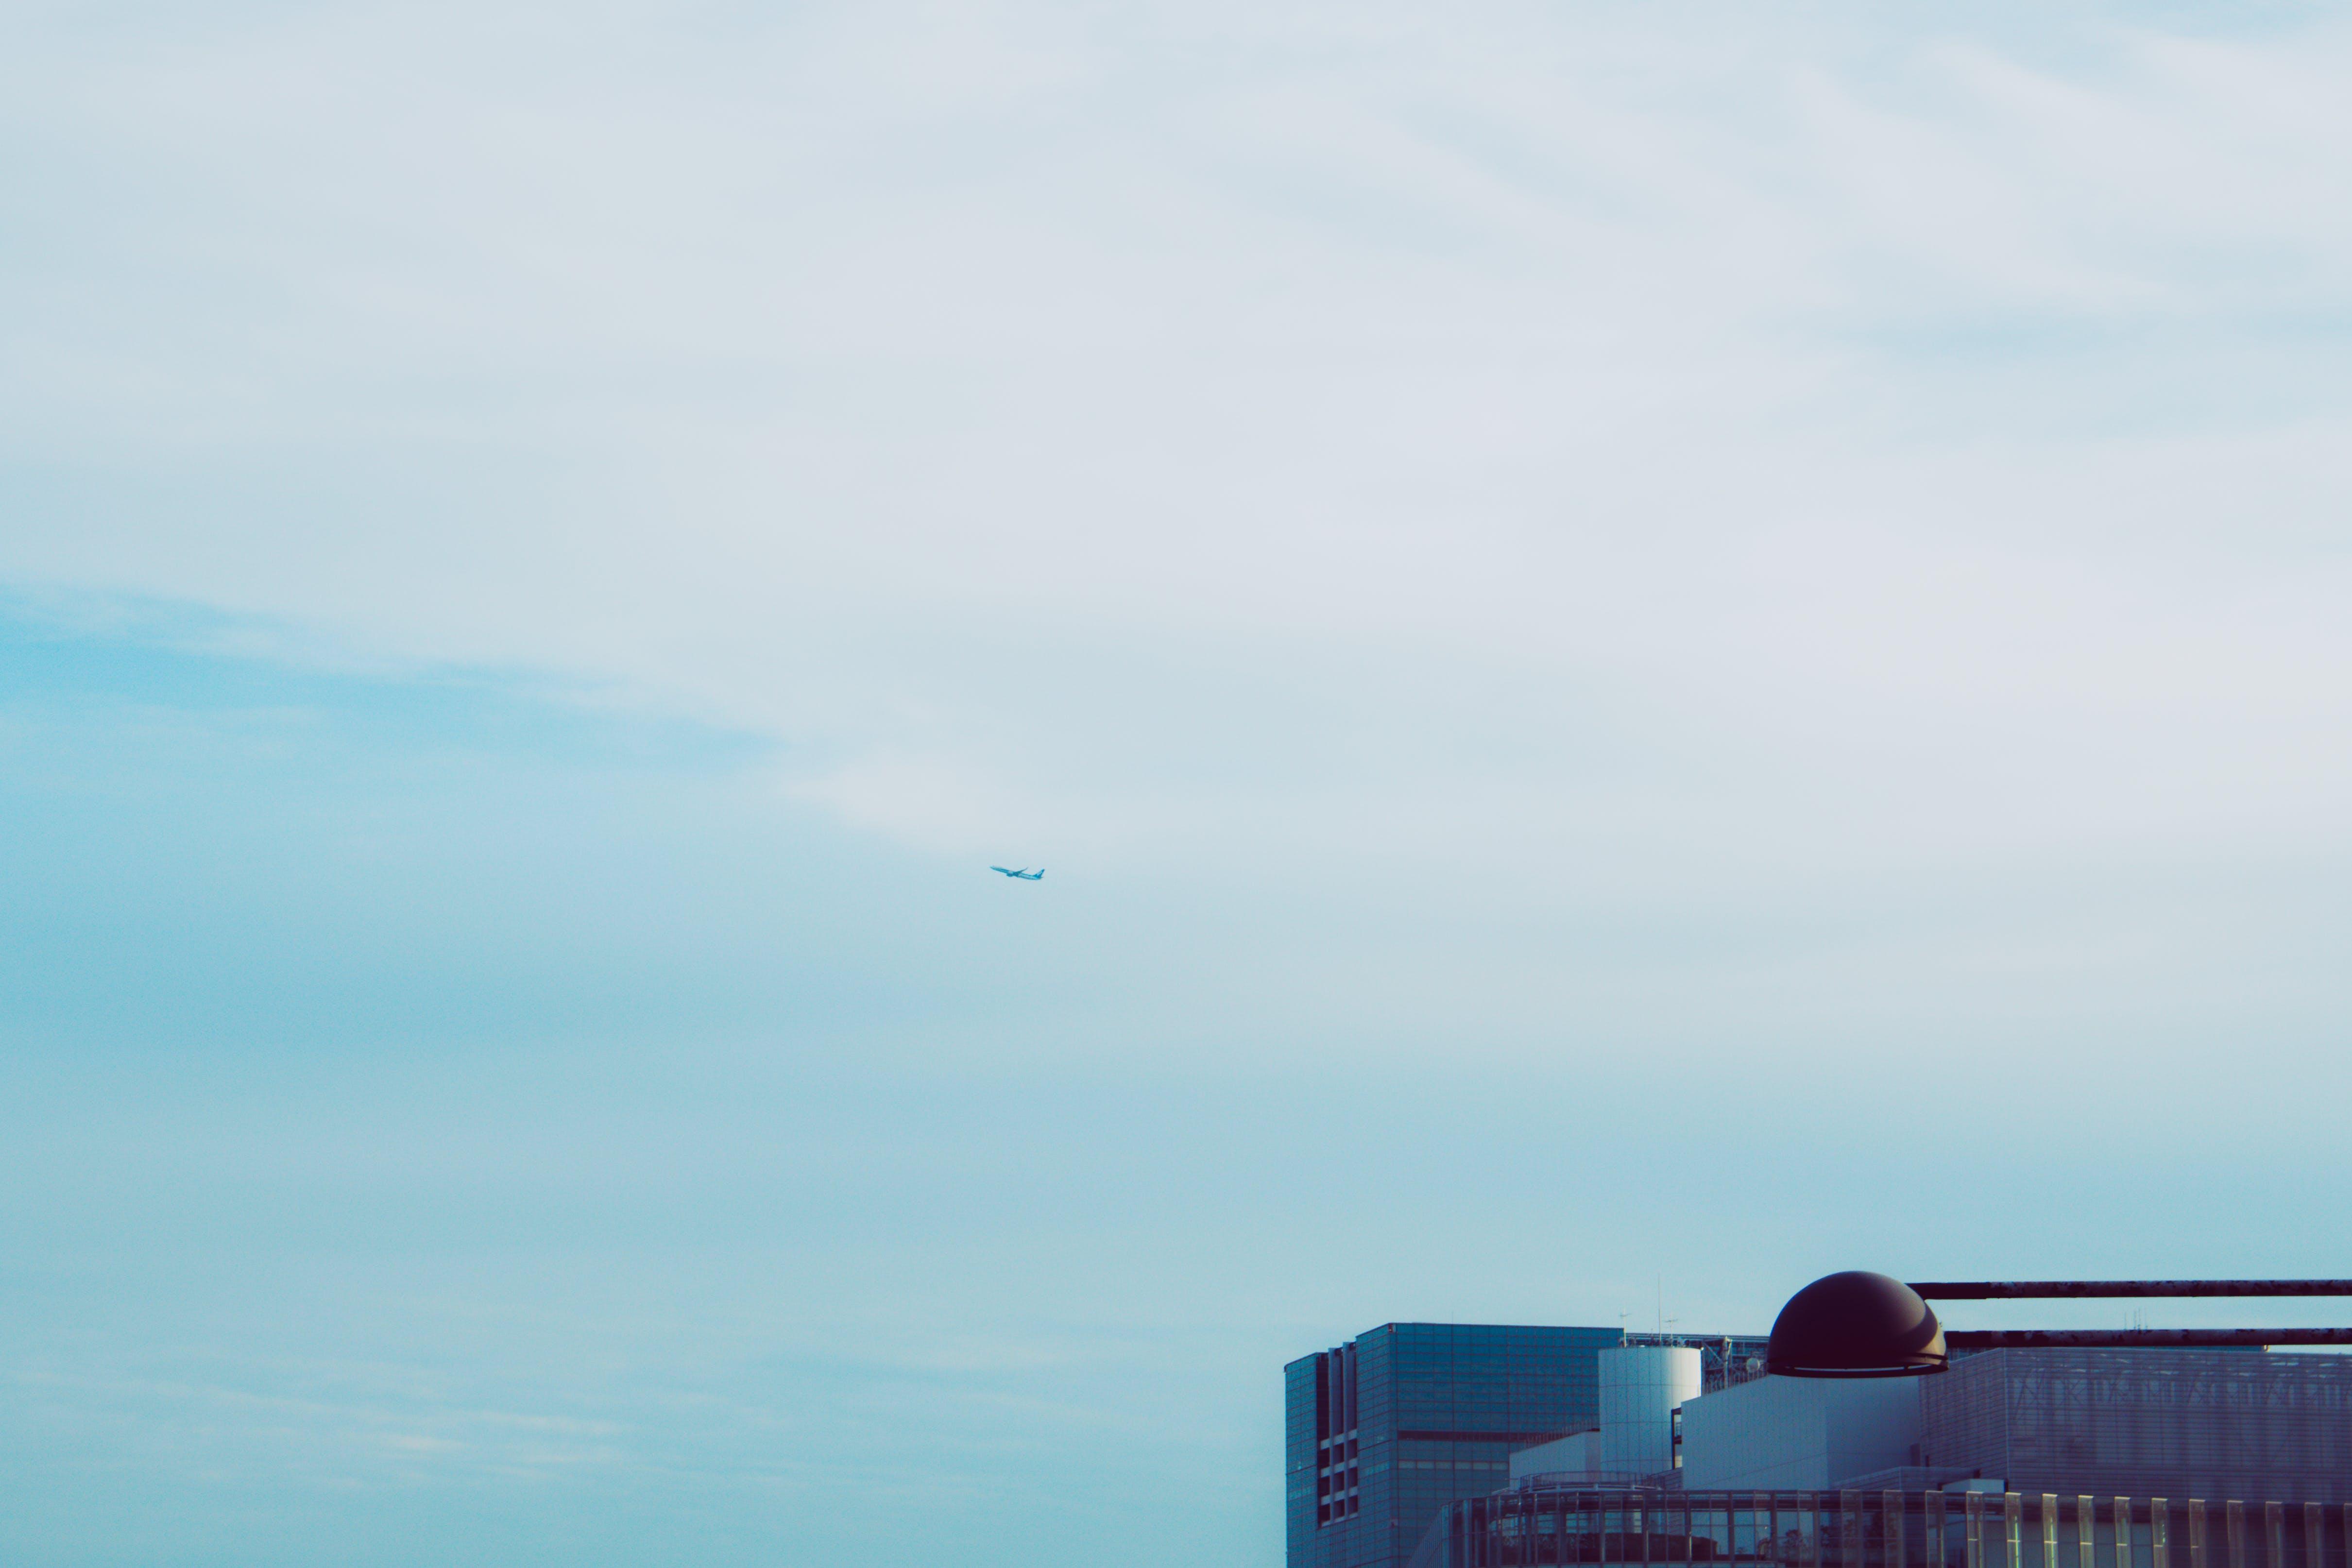 Plane Flying on Blue Sky